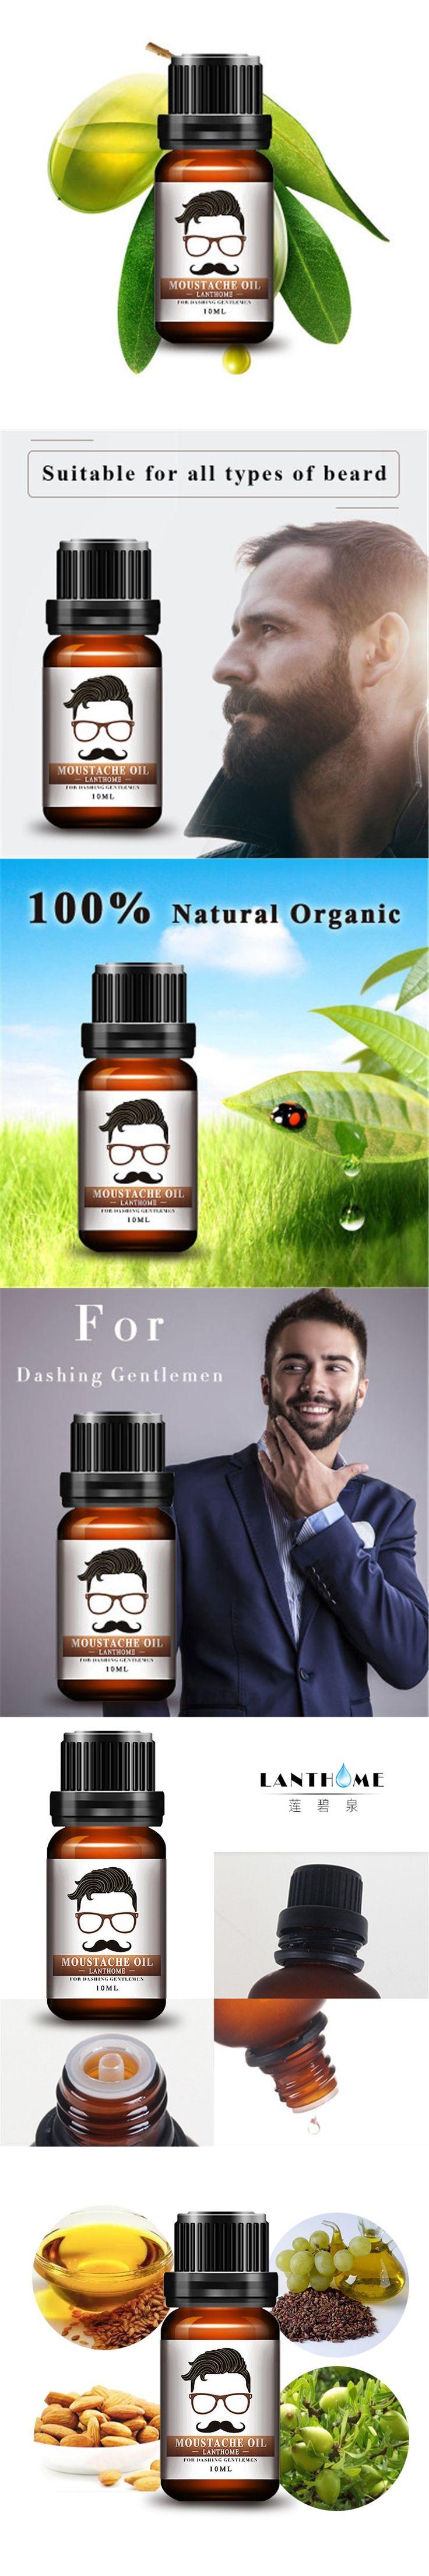 New Beard Growth oil beards hair Thicker Essence Mustache Thick sideburn Treatment Sunburst alopecia Serum Product beard shaping